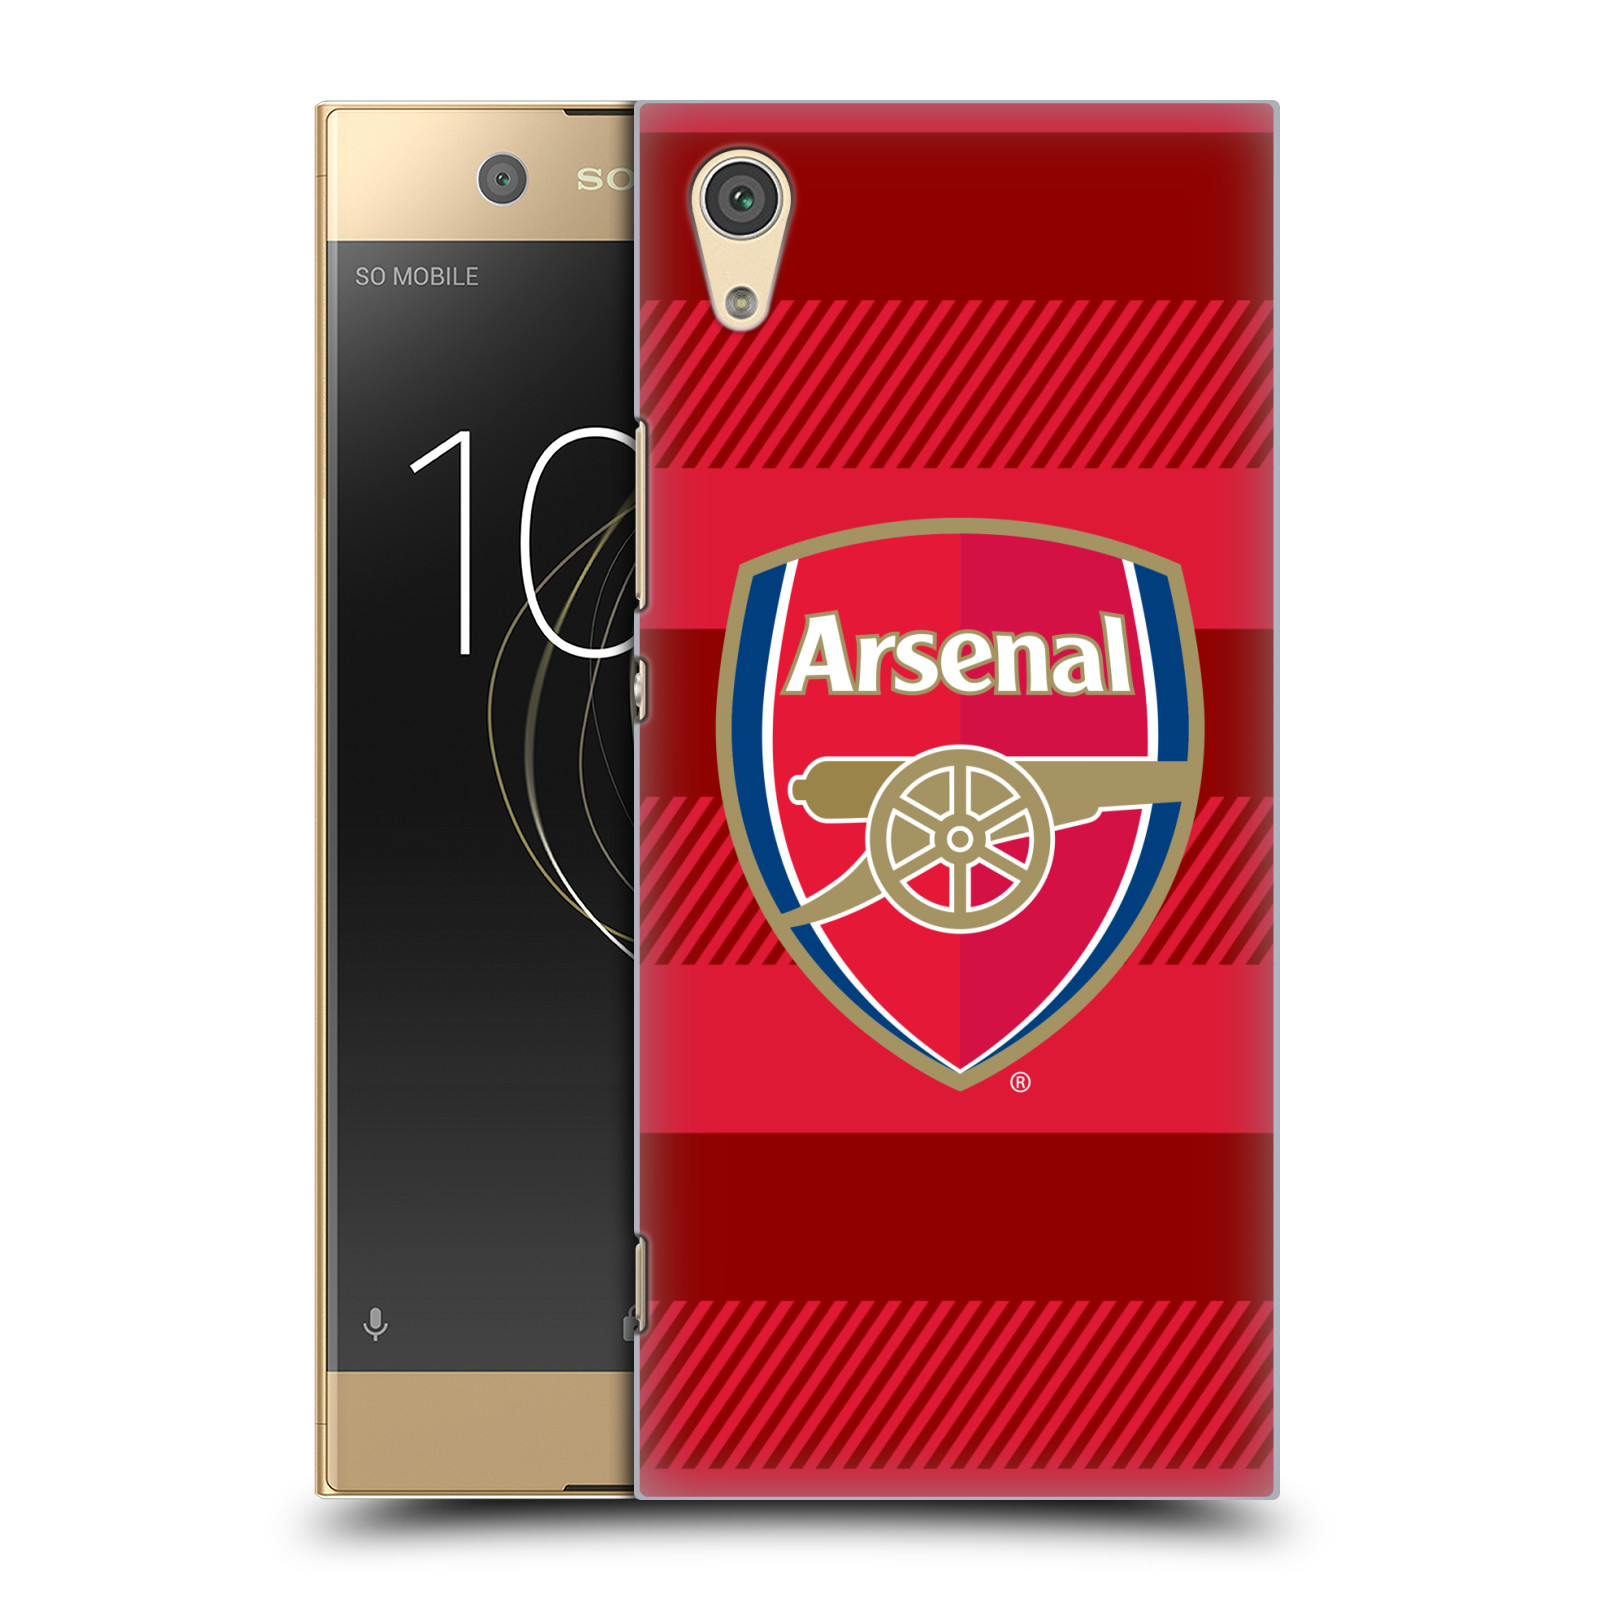 Plastové pouzdro na mobil Sony Xperia XA1 - Head Case - Arsenal FC - Logo s pruhy